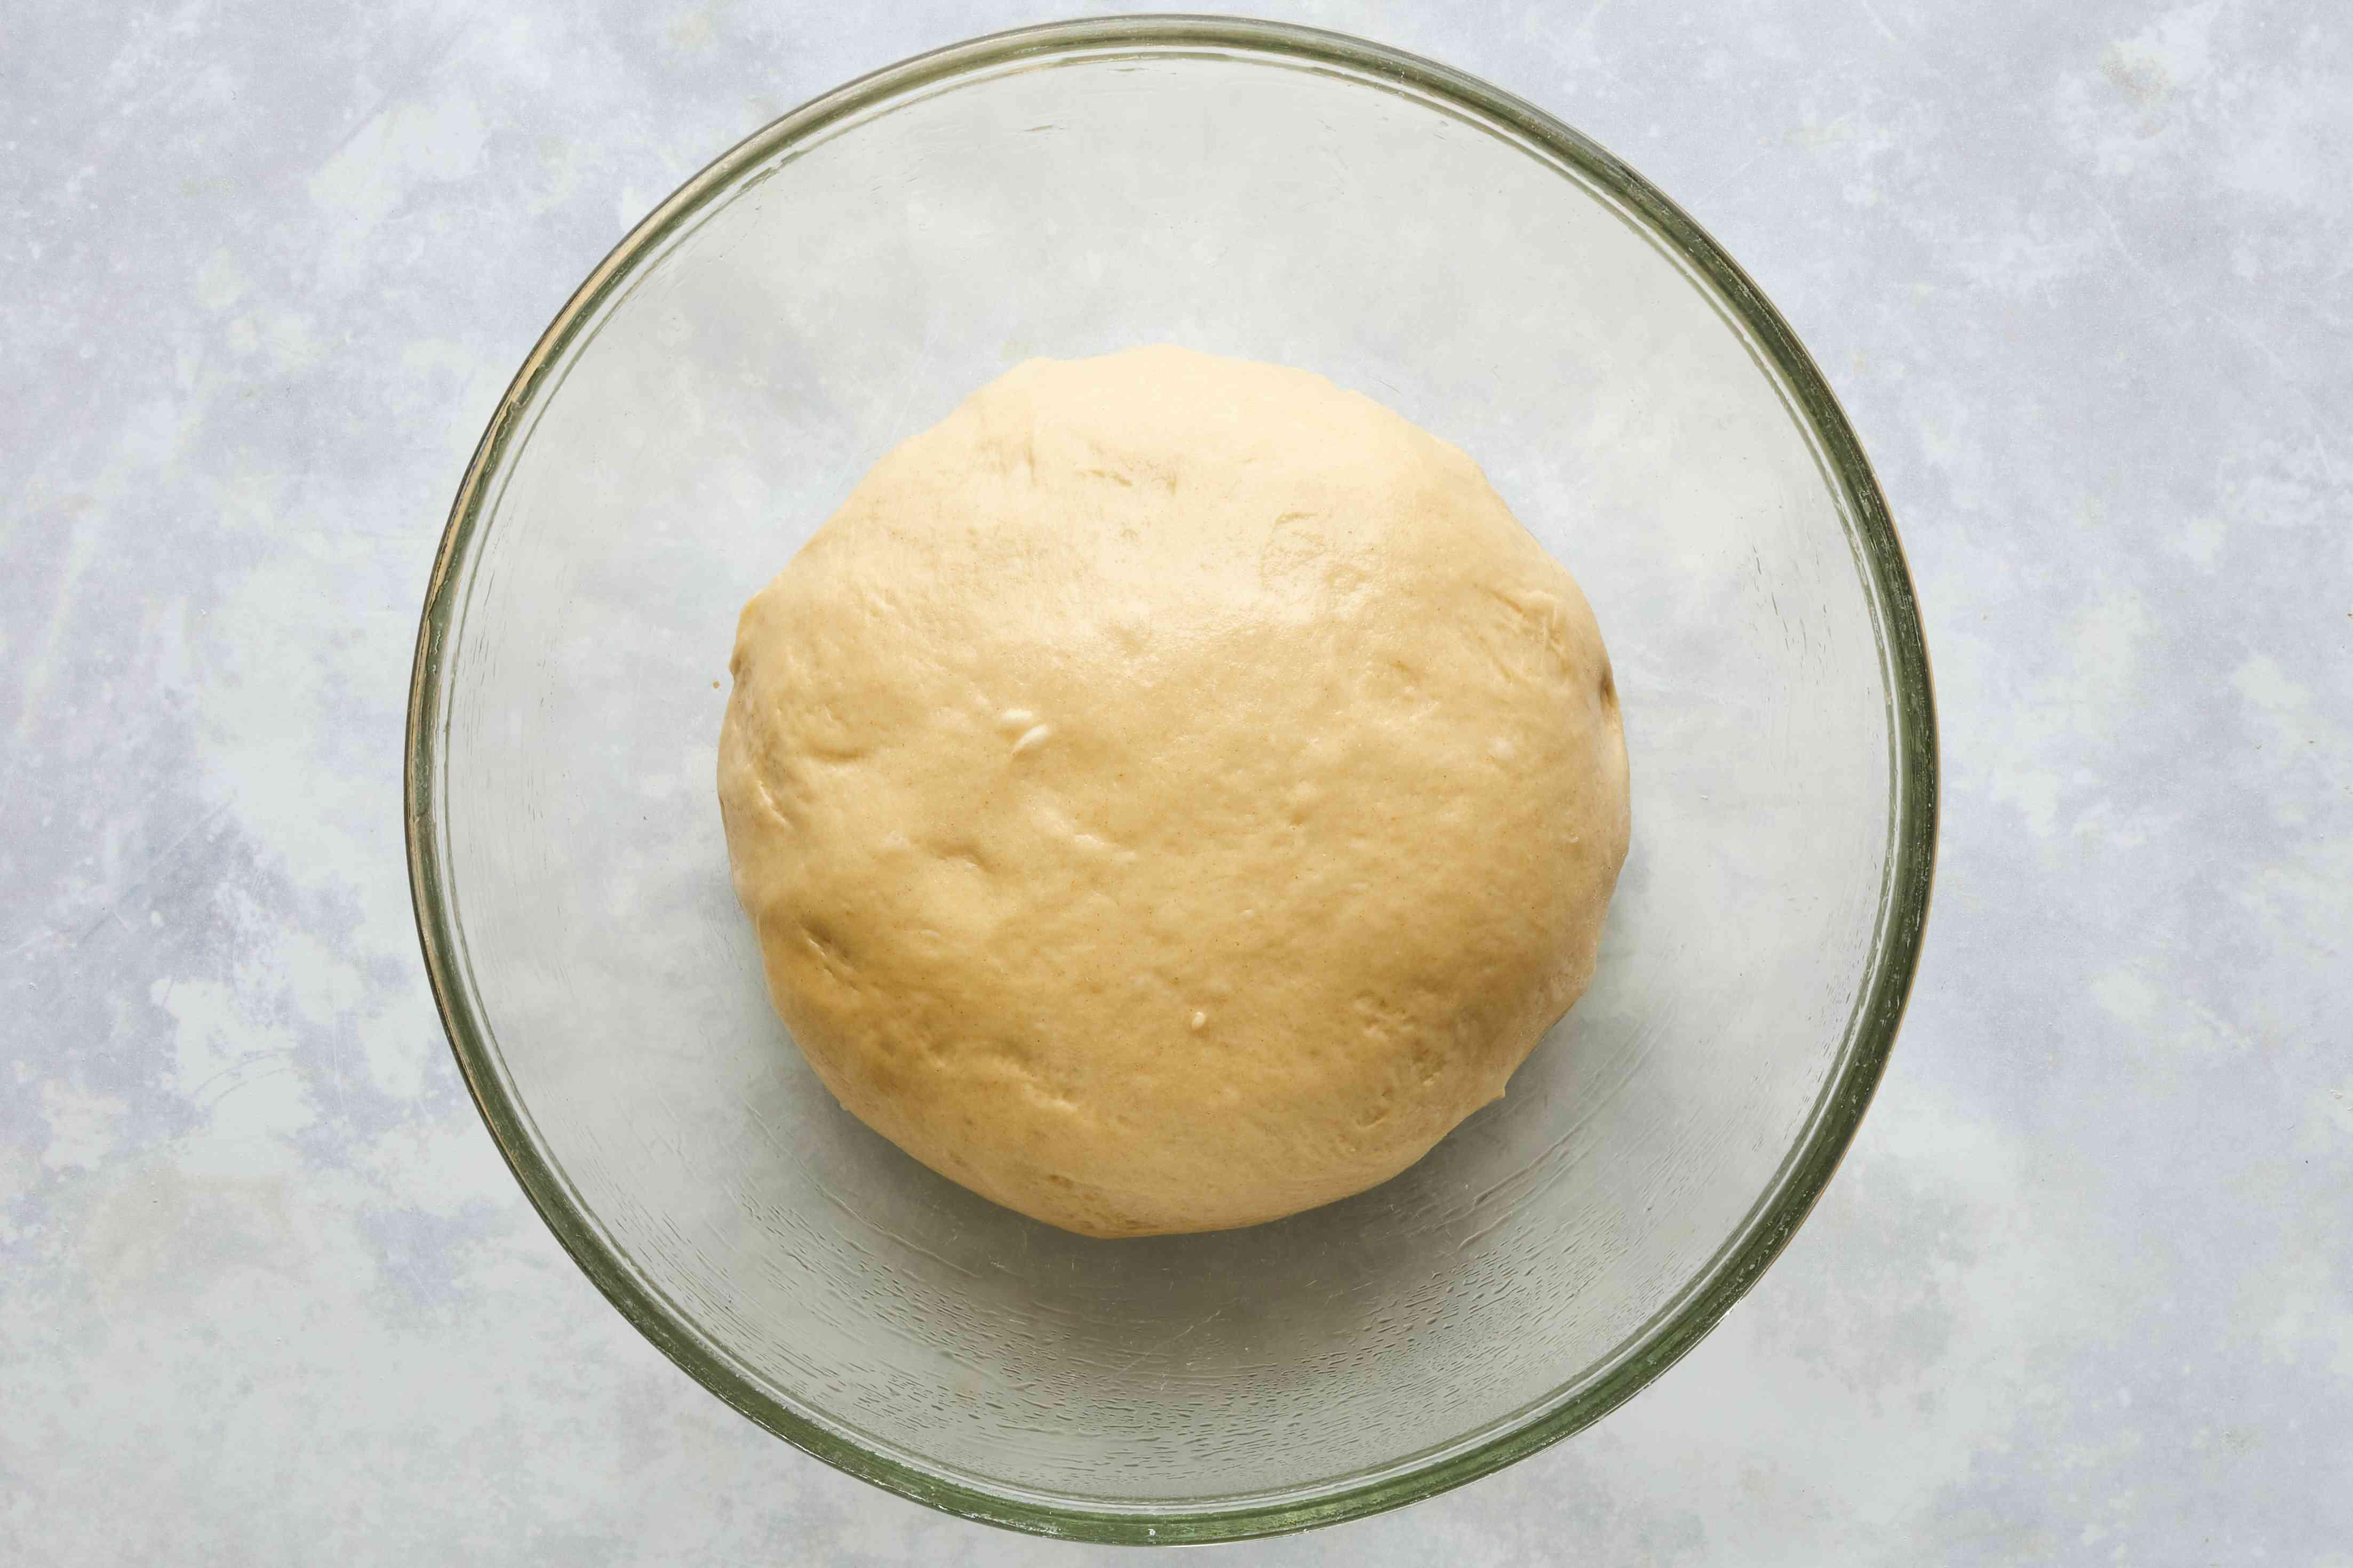 dough ball in a glass bowl